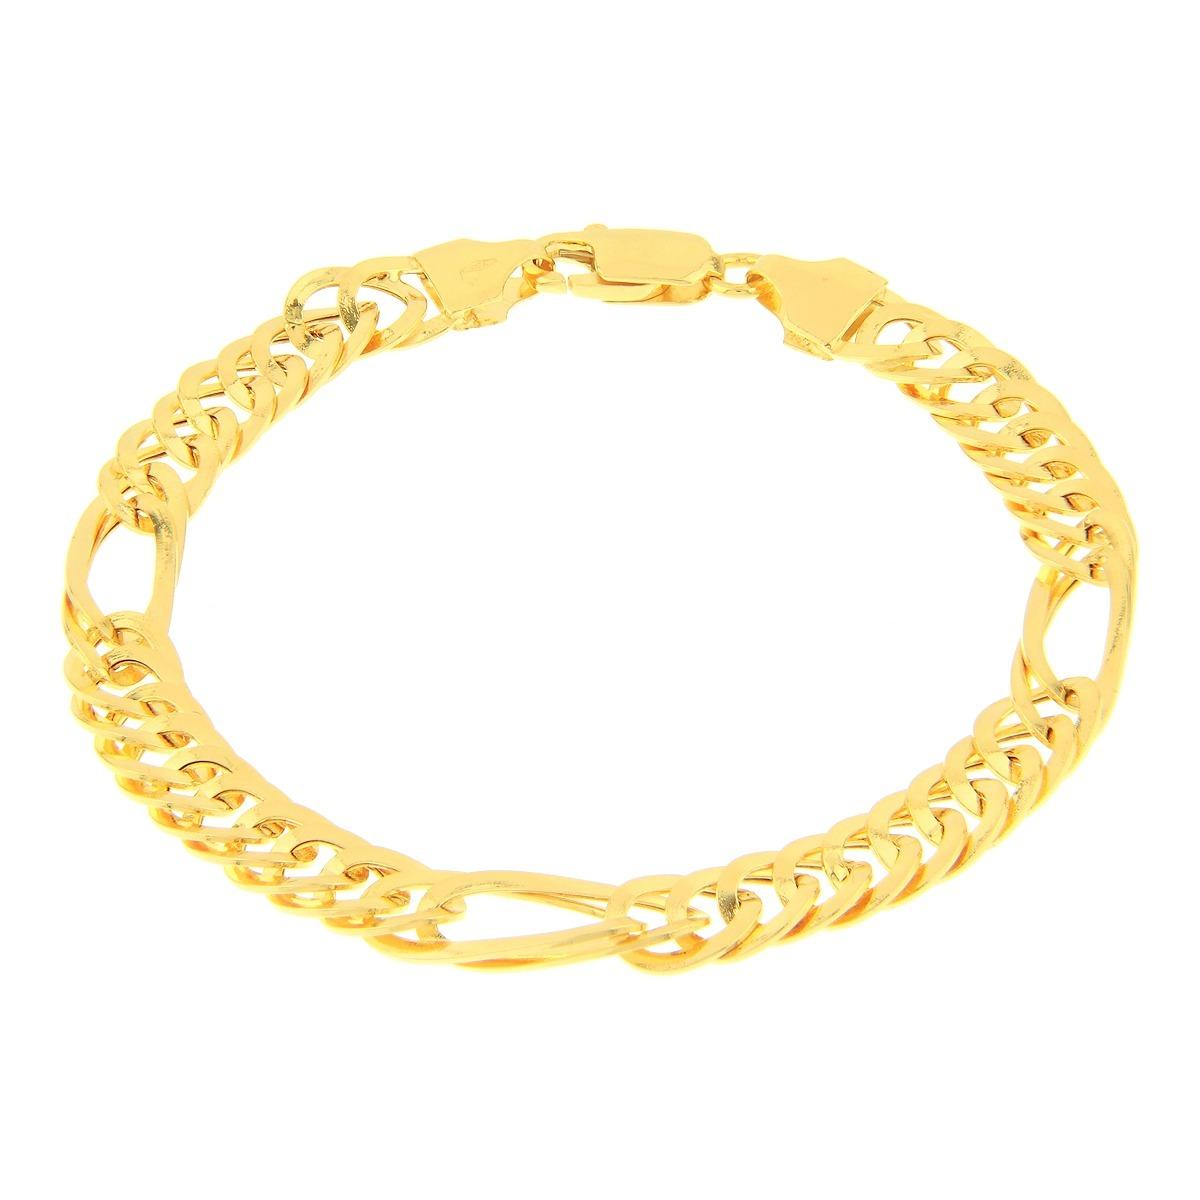 2b3c808292b pulseira de ouro 18k masculina malha grumet grossa. Carregando zoom.